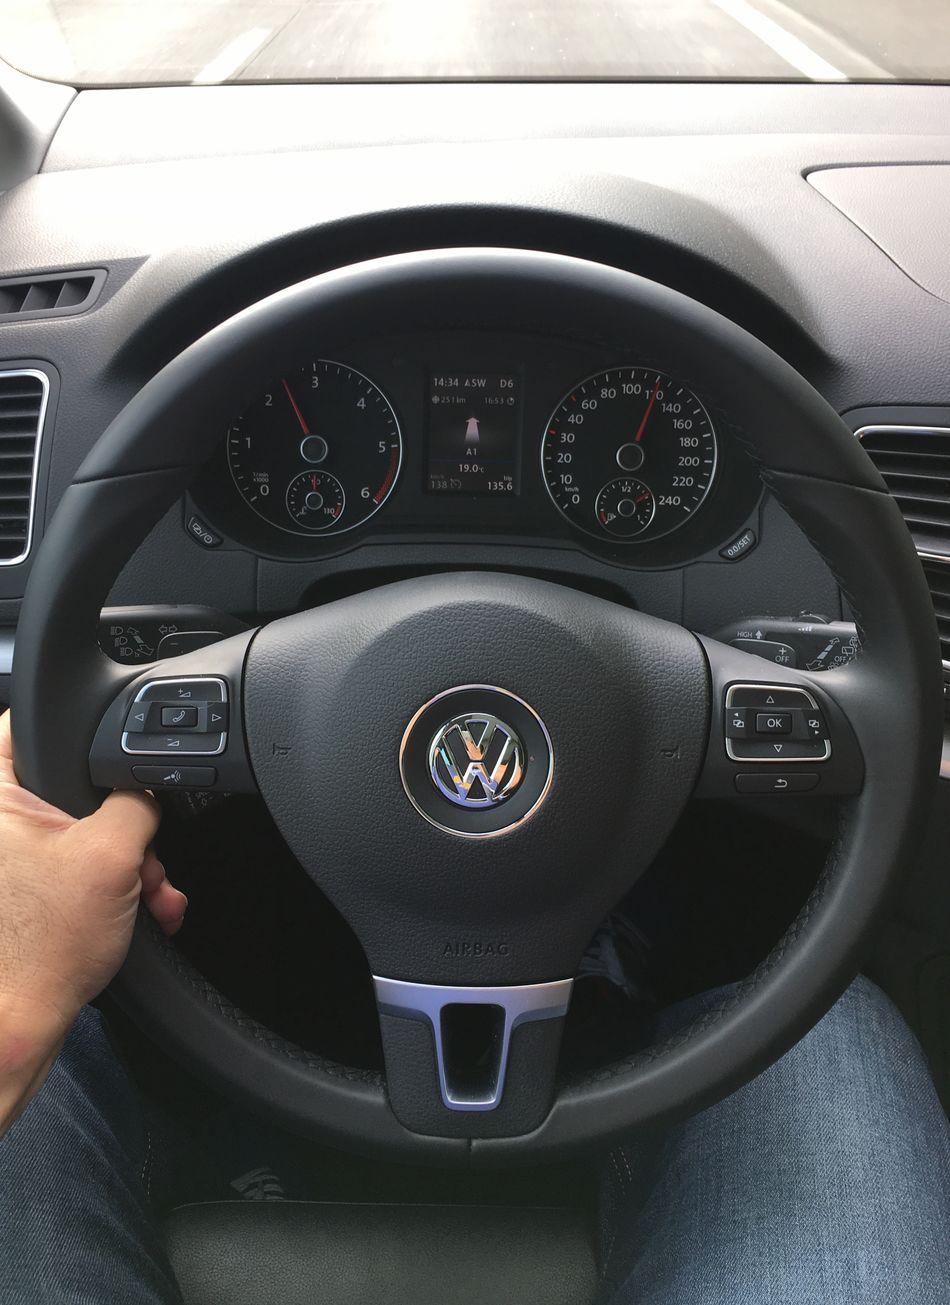 …driving this @VW Sharan towards Rosenheim!